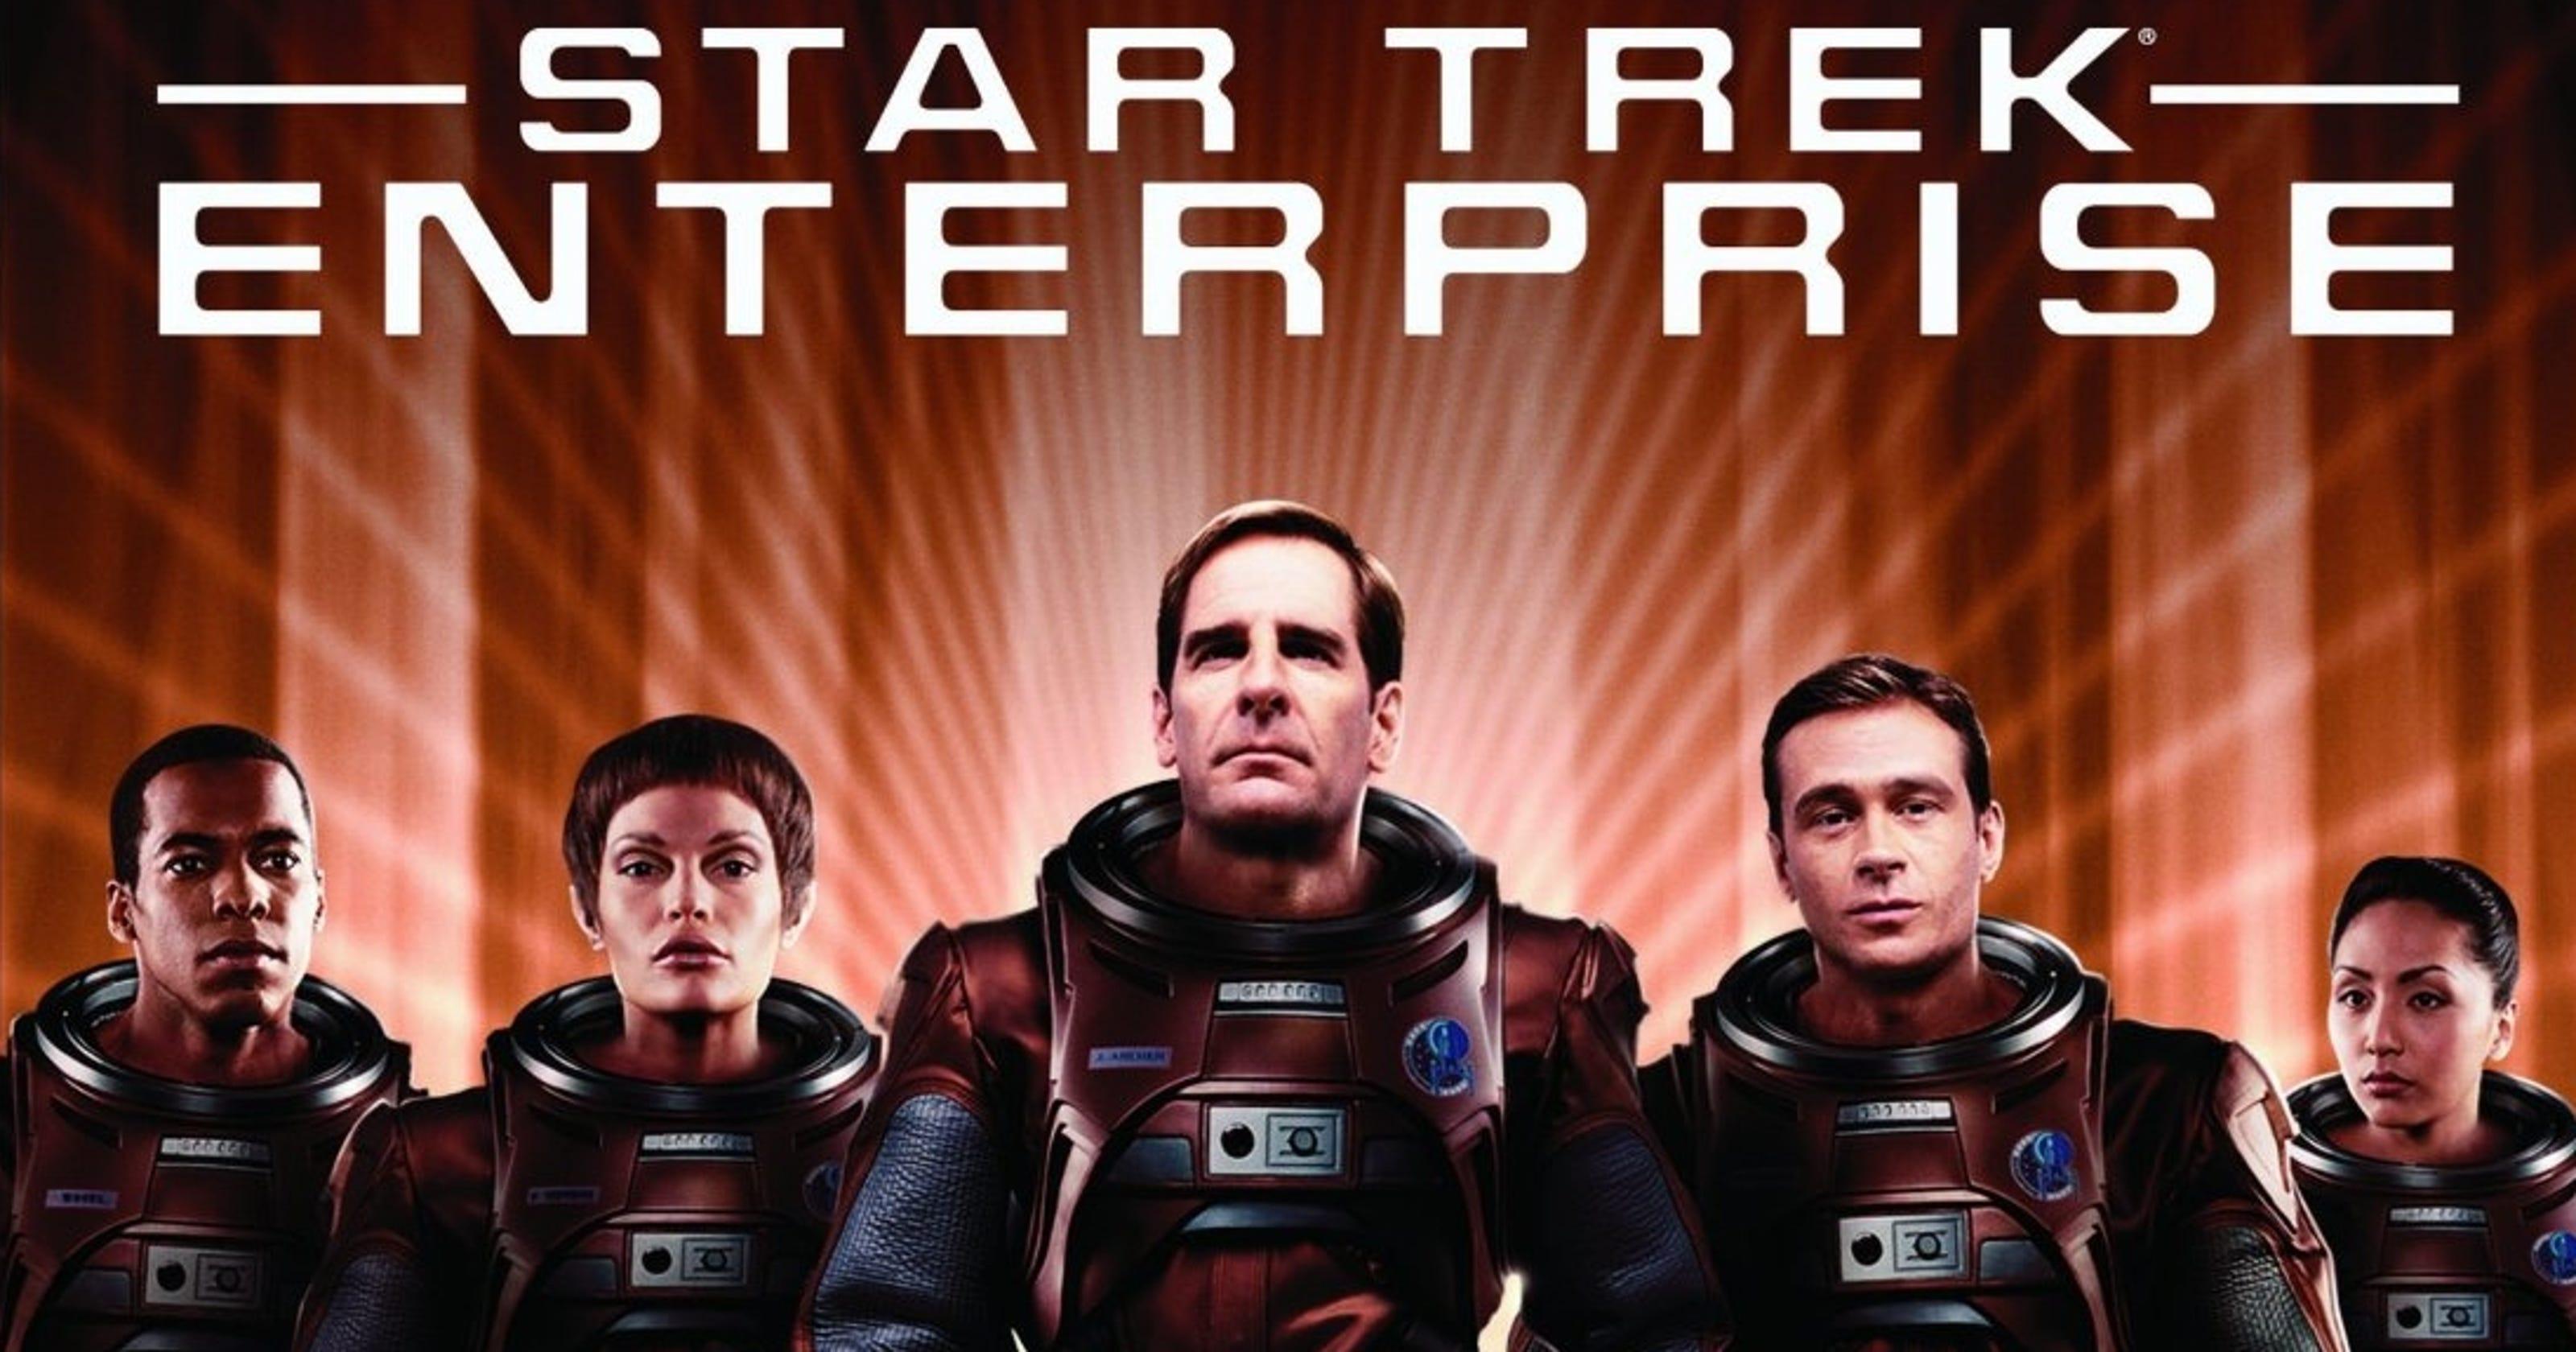 1st season of 'Star Trek: Enterprise' comes to Blu-ray